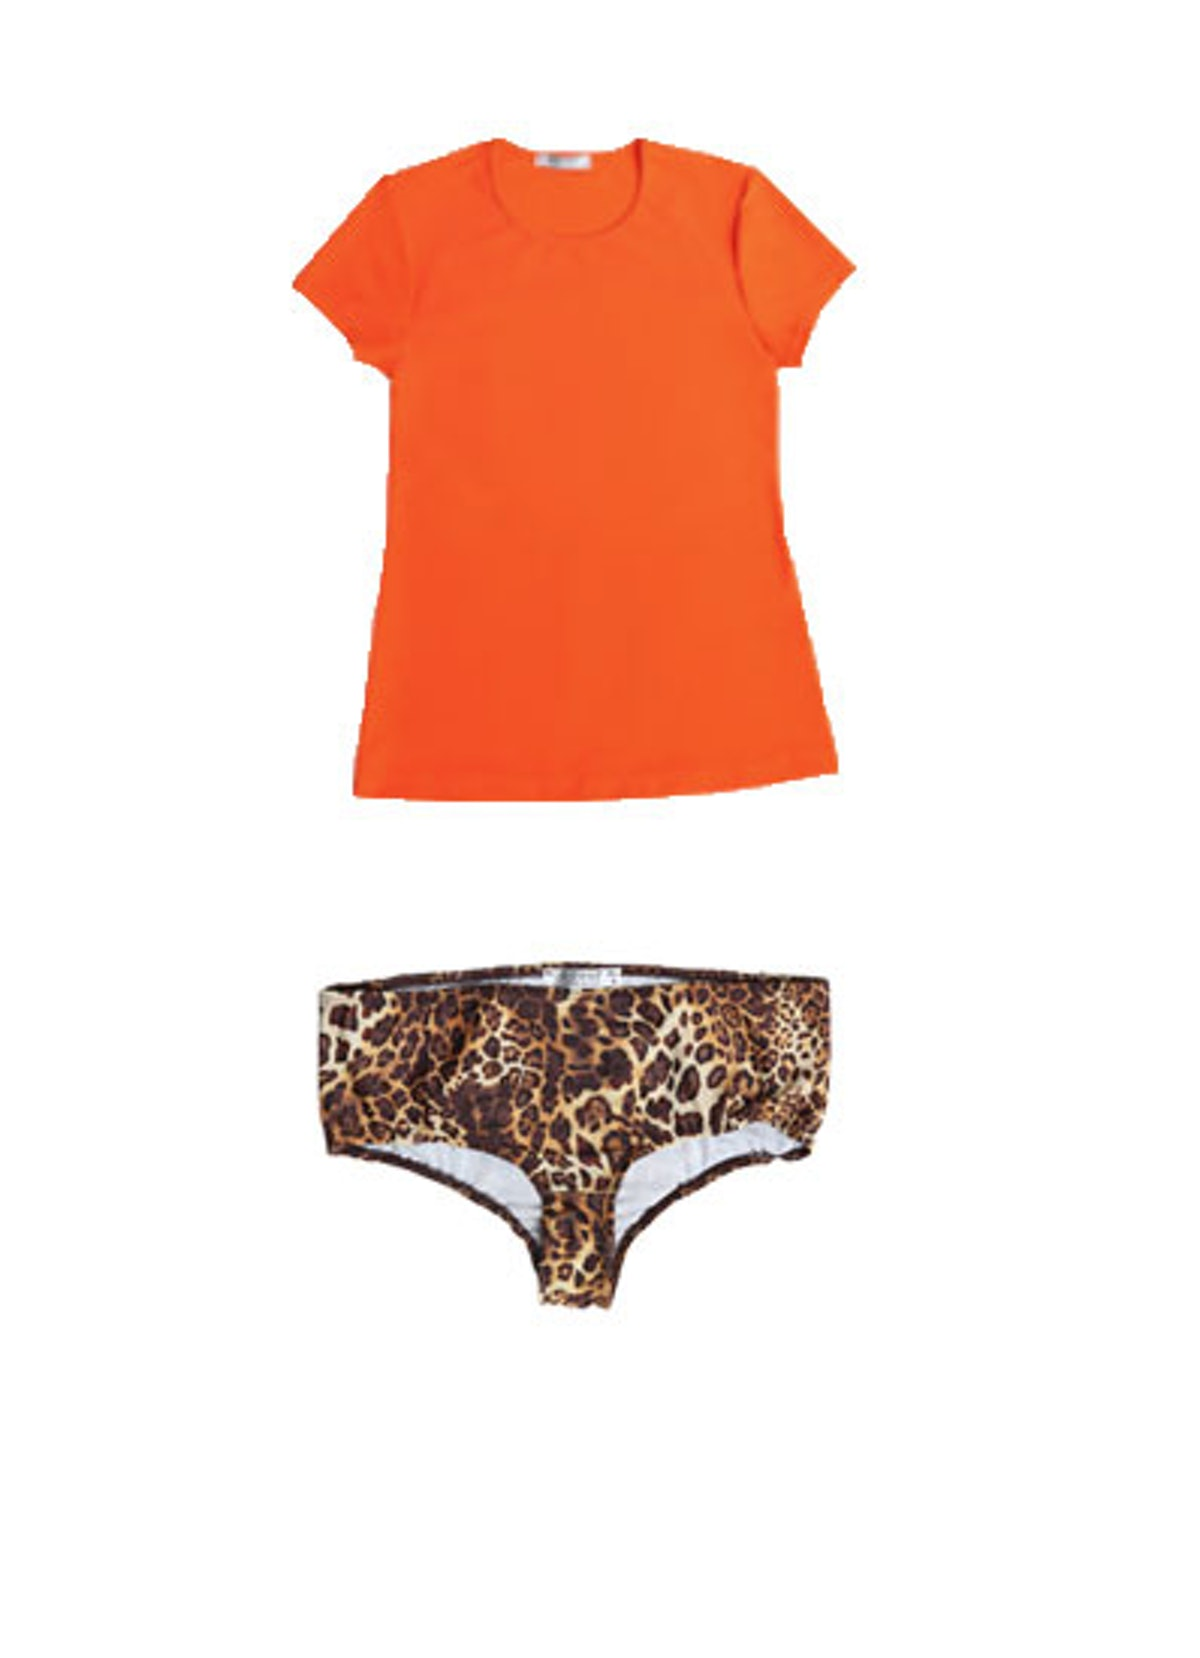 fass-animal-print-swimwear-trend-07-v.jpg